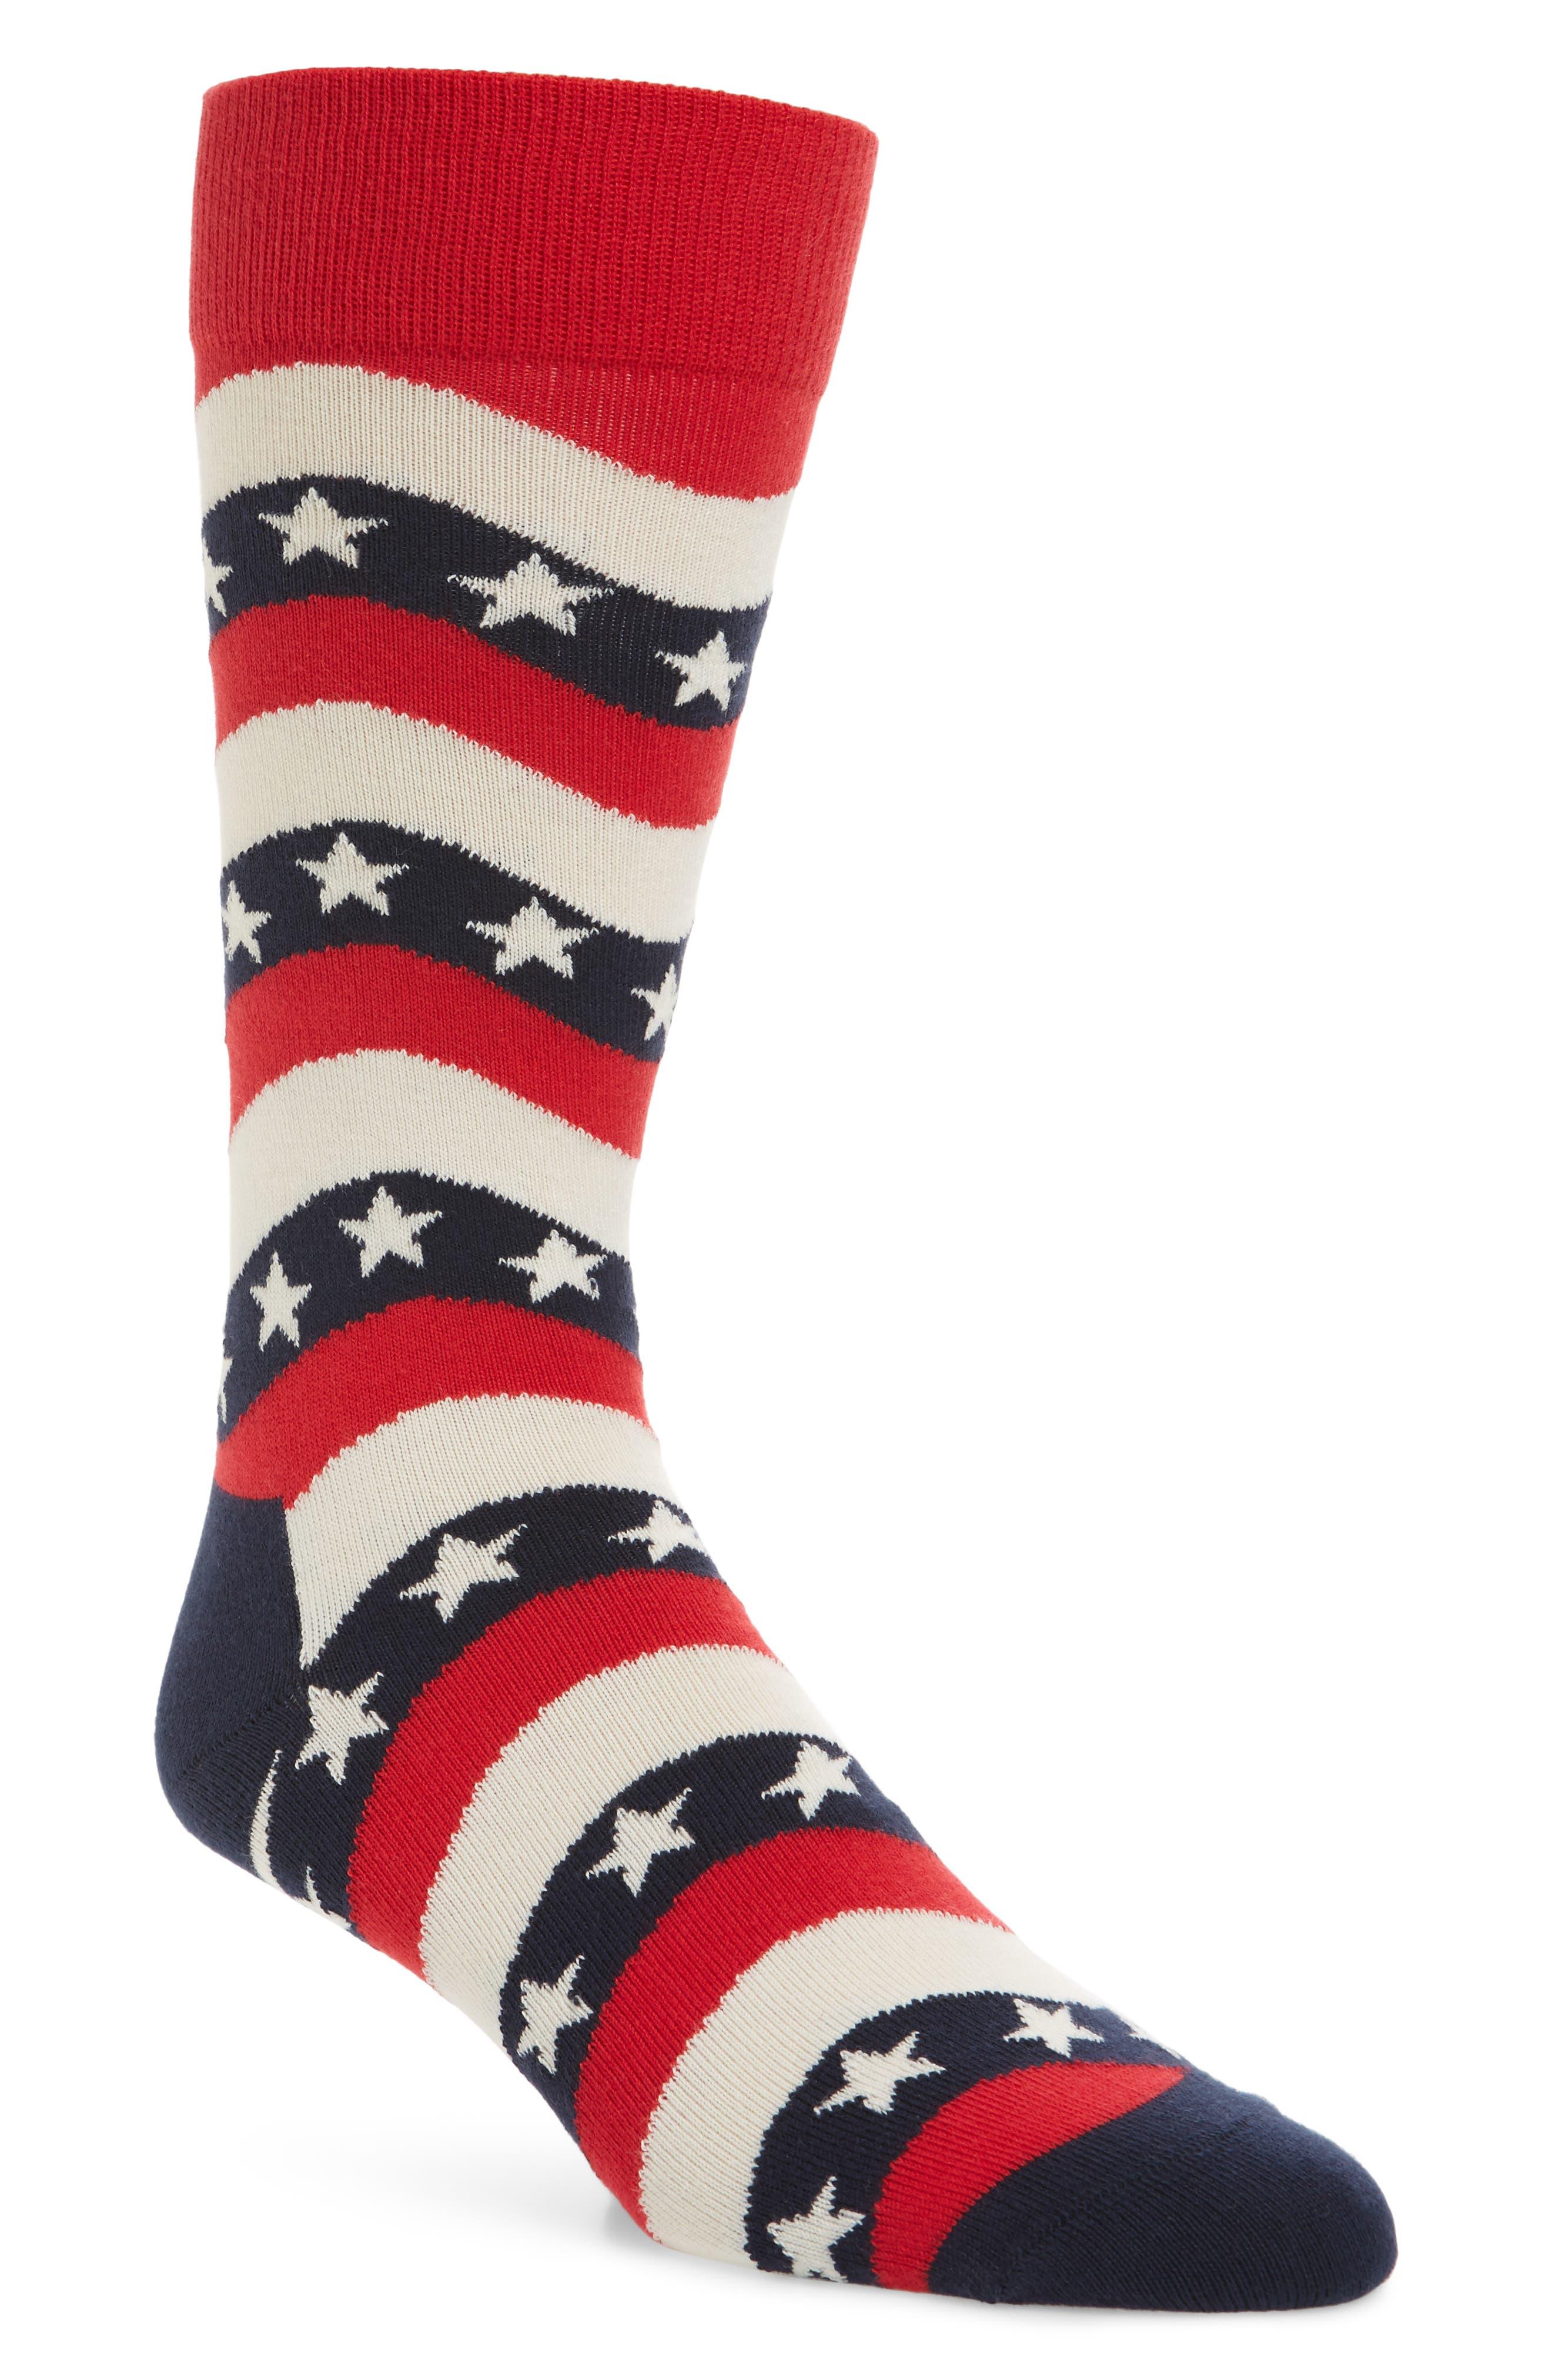 Wavy Socks,                             Main thumbnail 1, color,                             Navy Multi